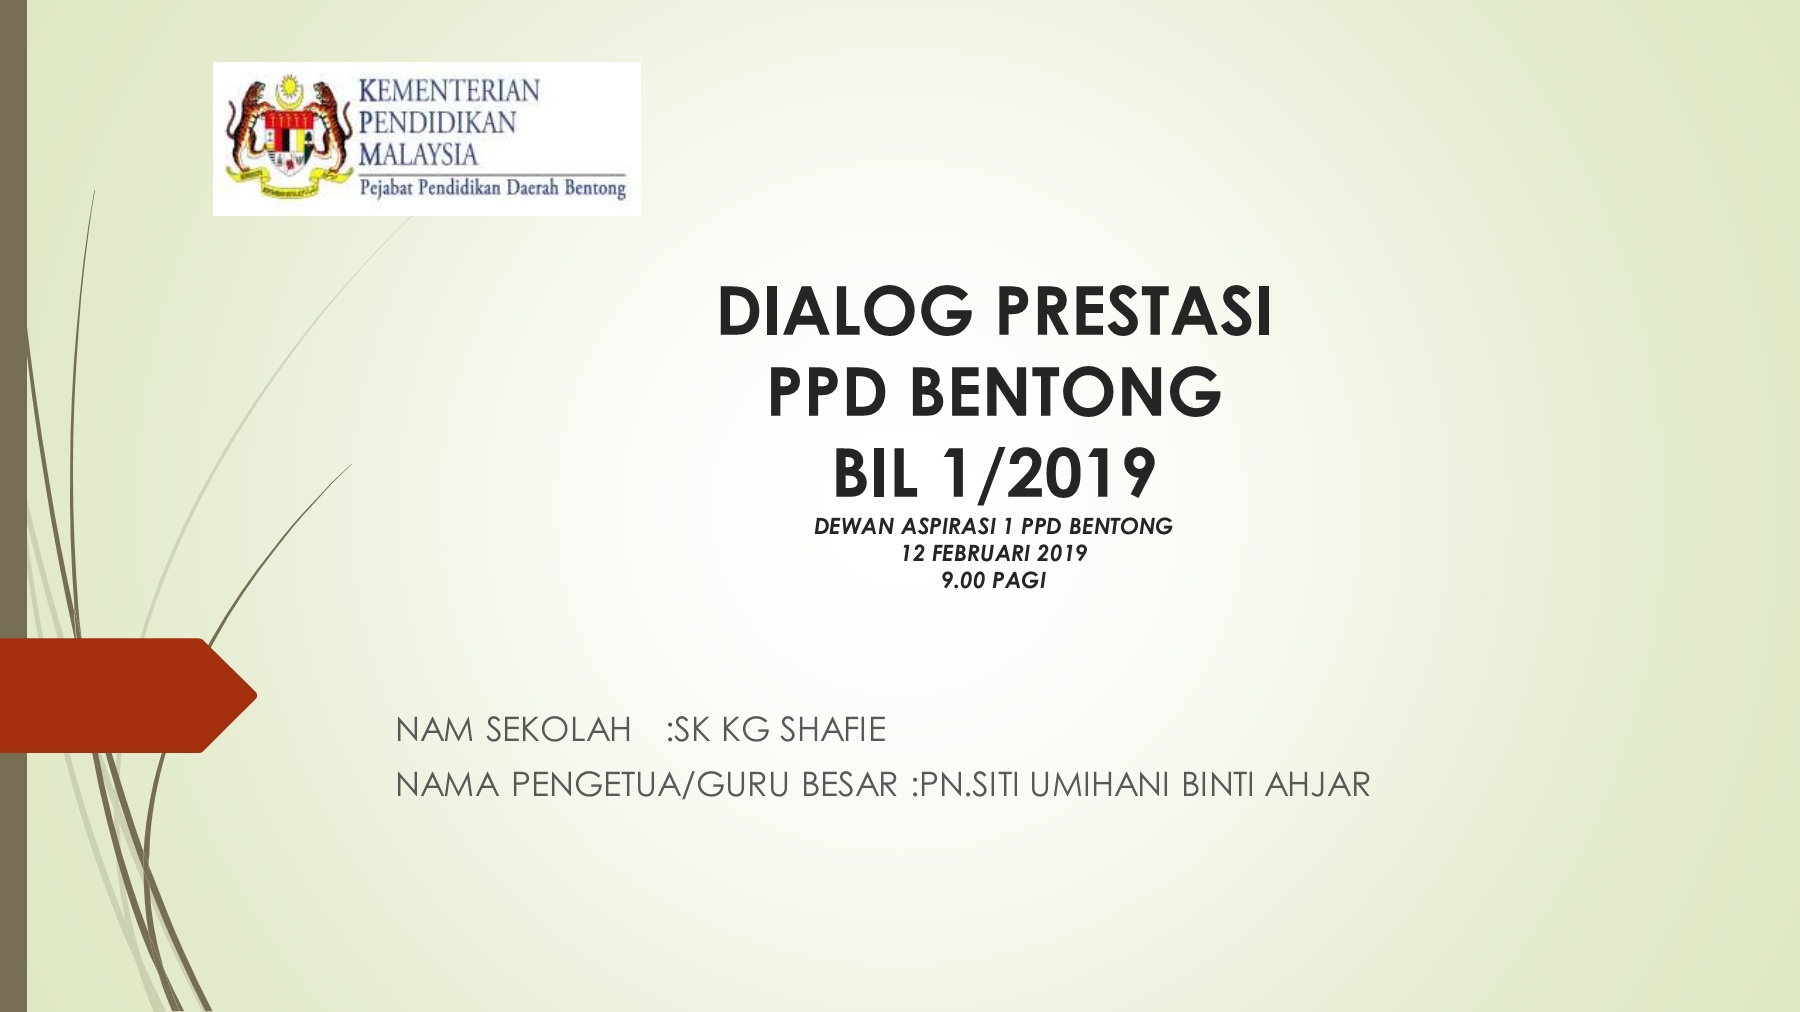 Dialog Prestasi Ppd Bentong Bil 1 2019